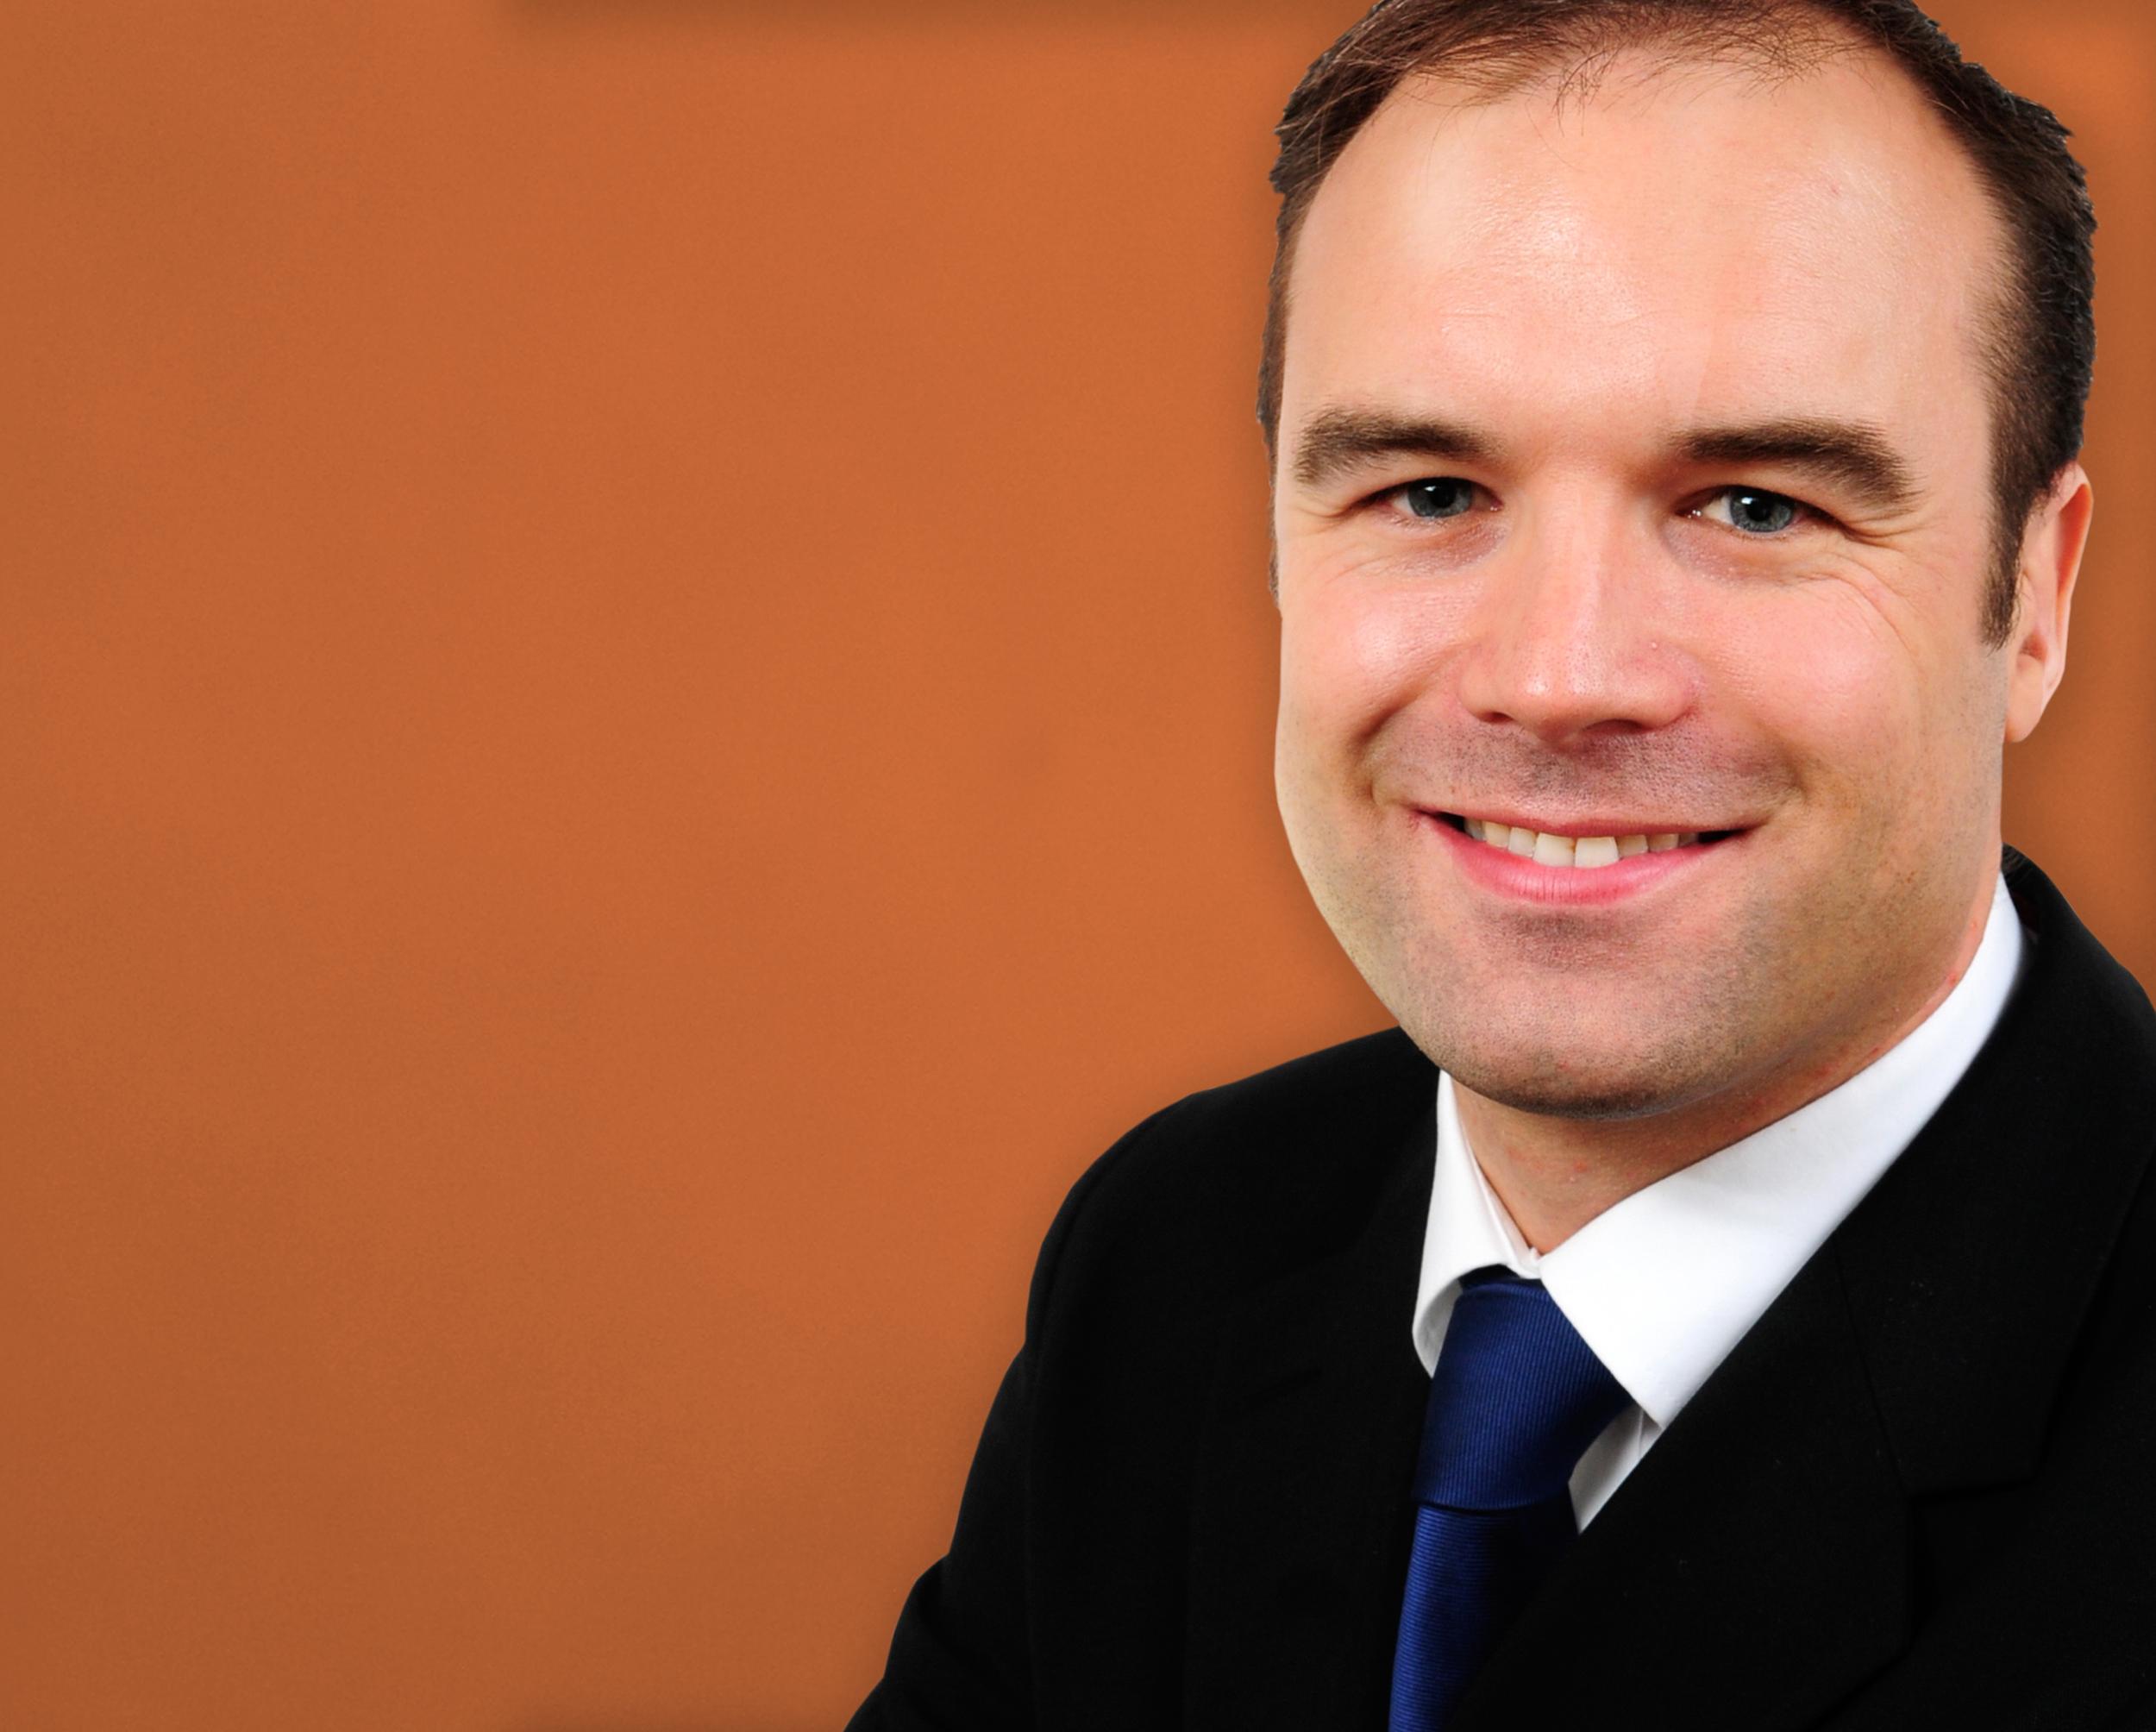 Rob Tice, Head of Employment Law at Flint Bishop